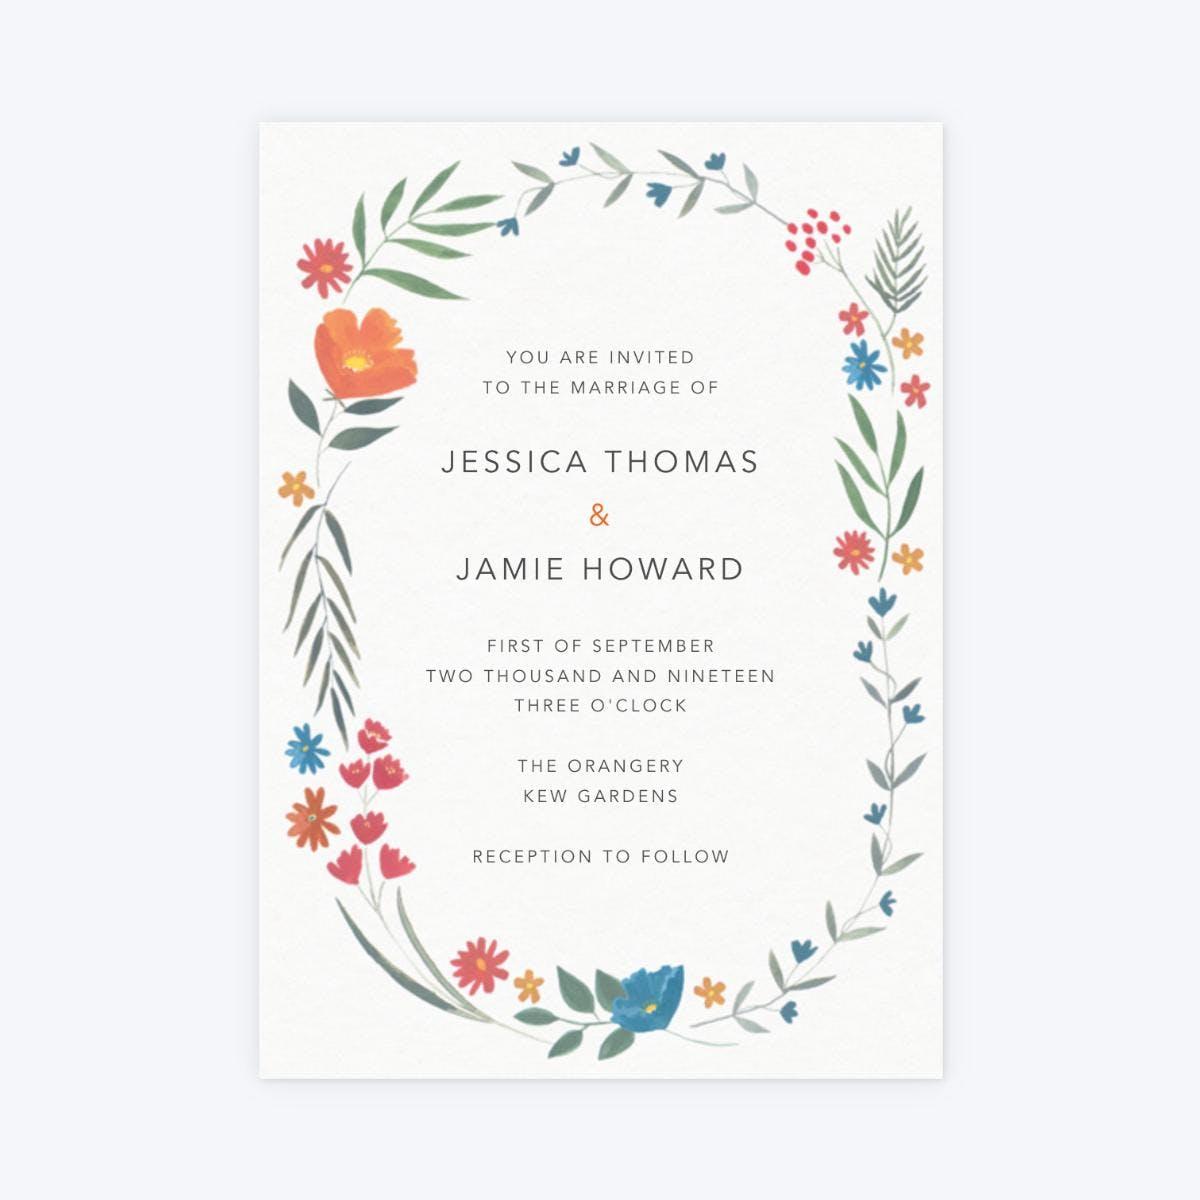 autumn meadow papier wedding invitation